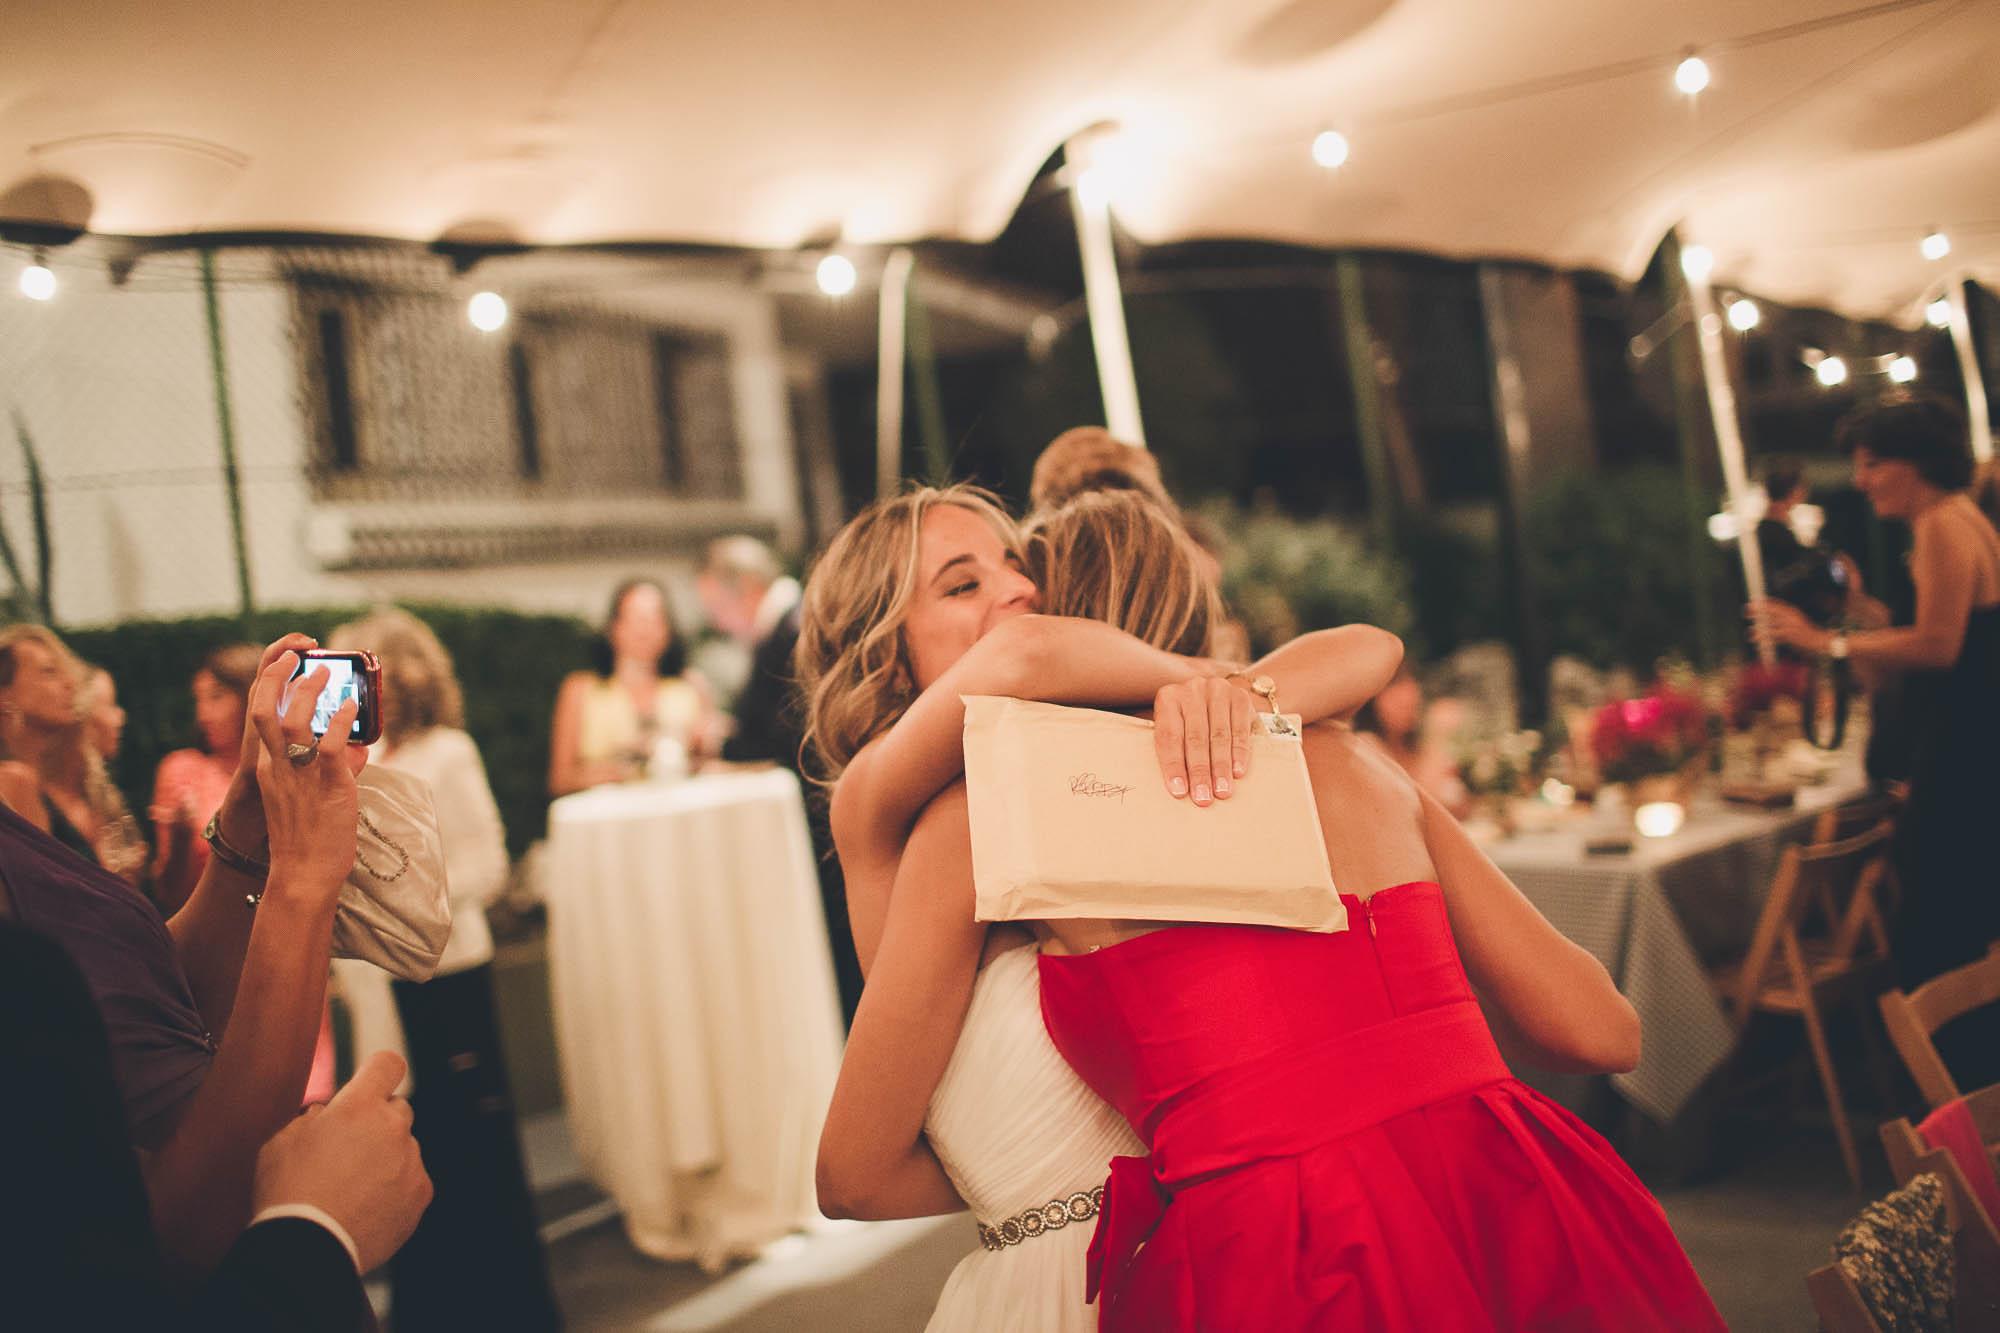 La novia abraza a las invitadas